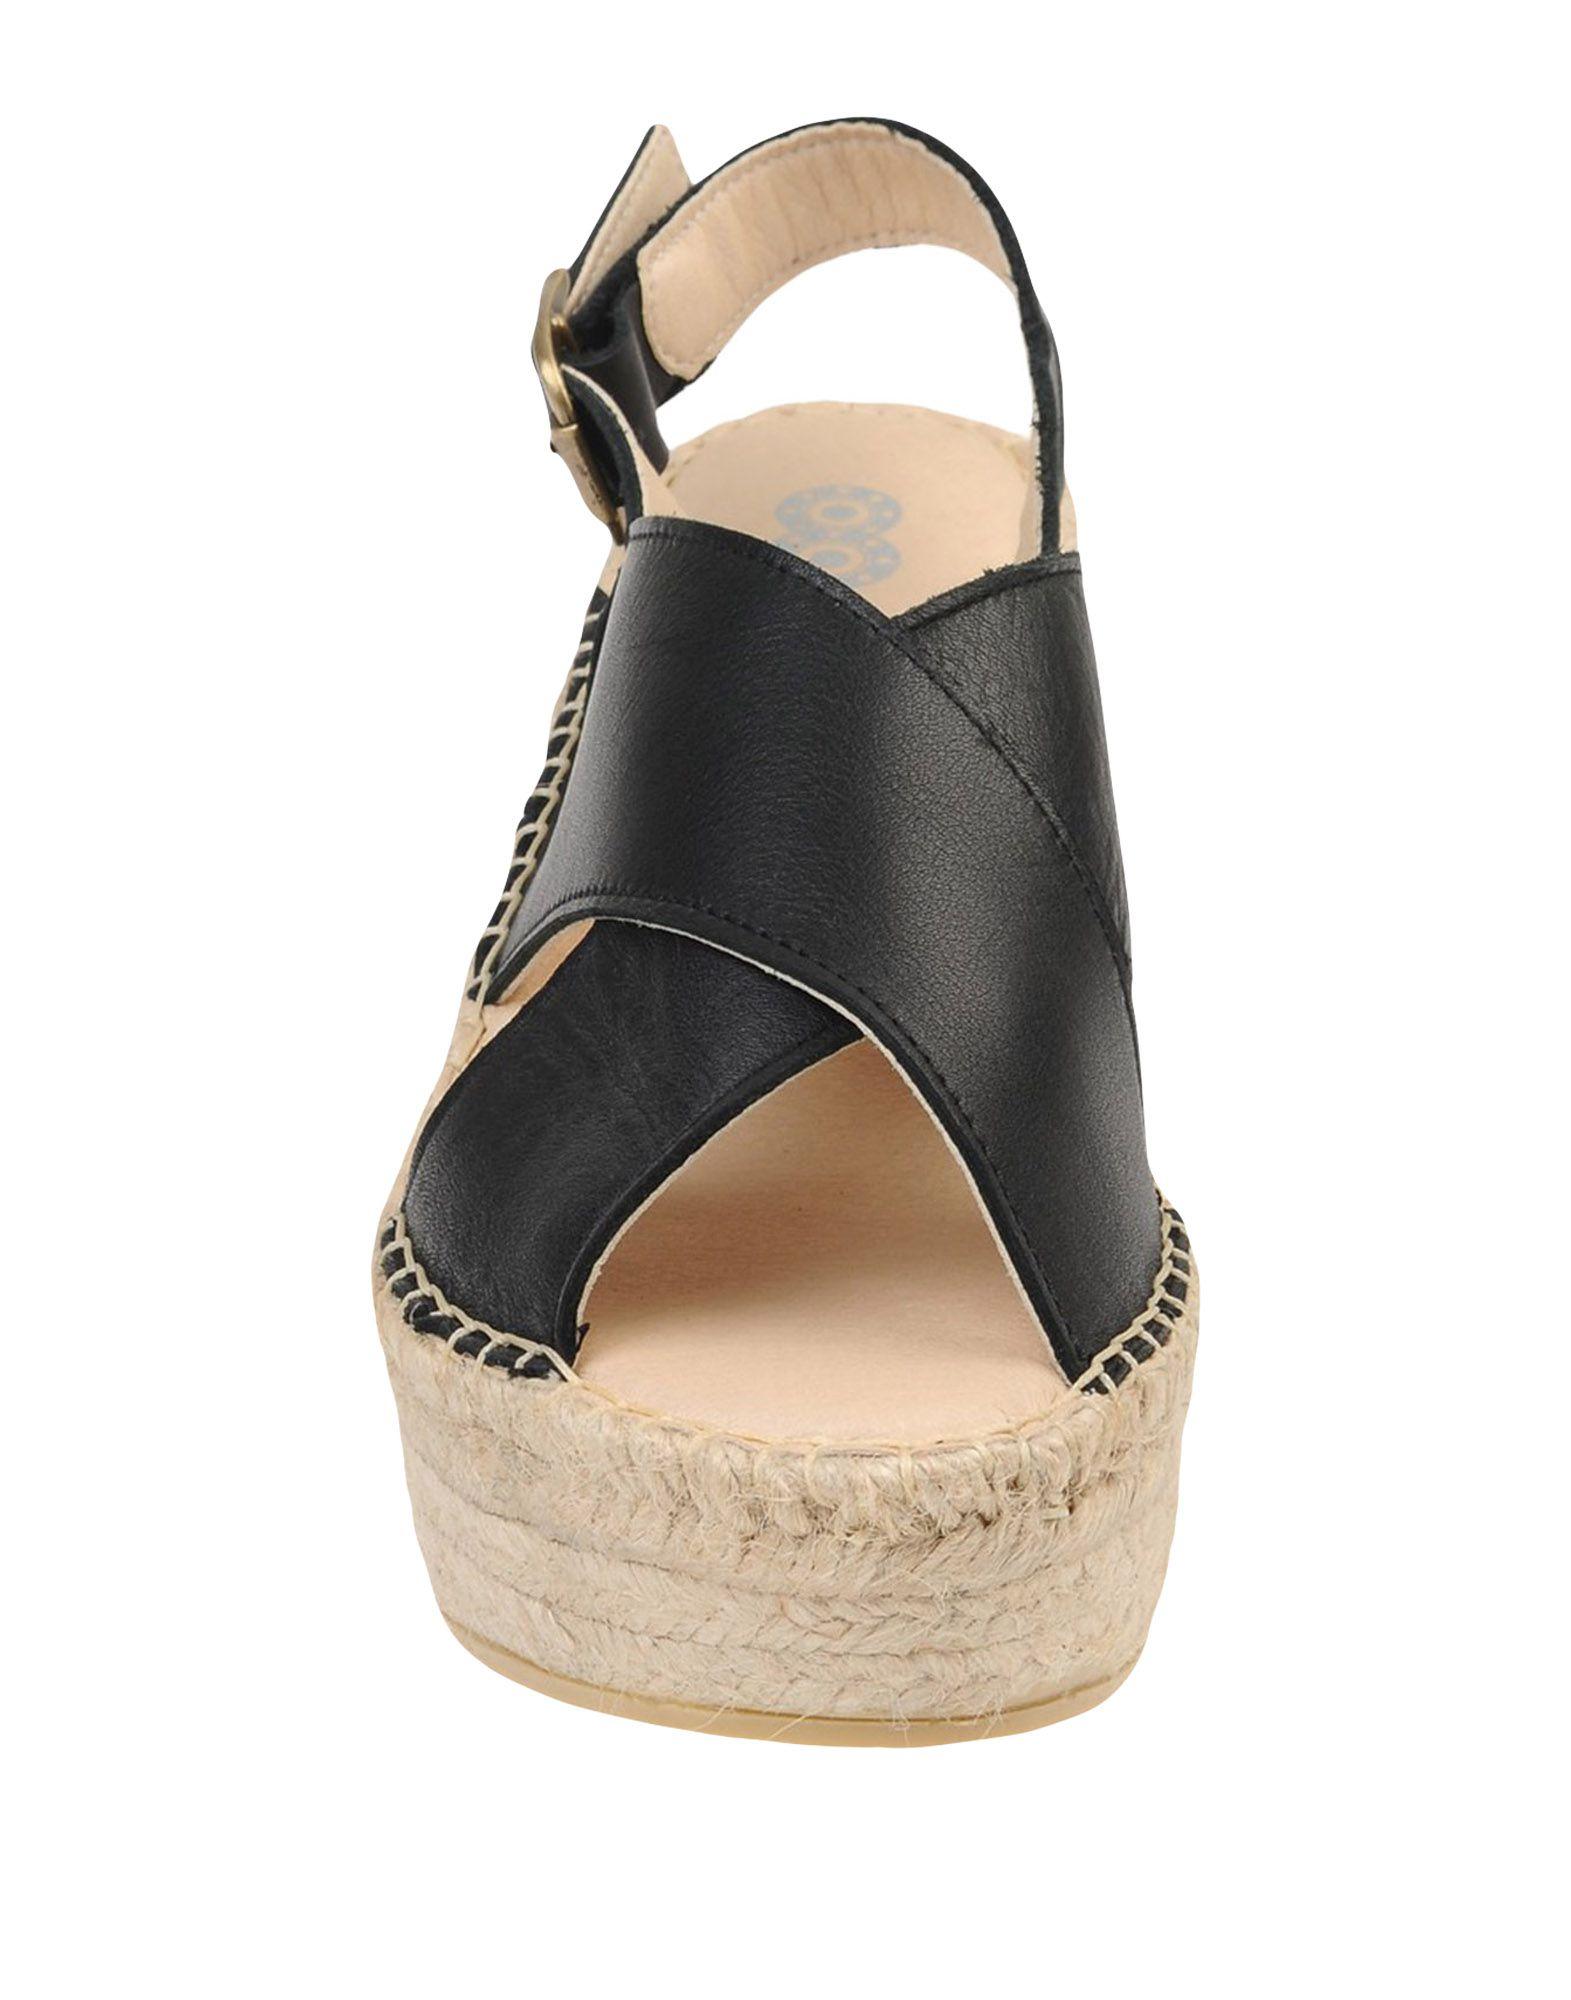 8 Espadrilles Damen  11483491AR Qualität Gute Qualität 11483491AR beliebte Schuhe 45cc24